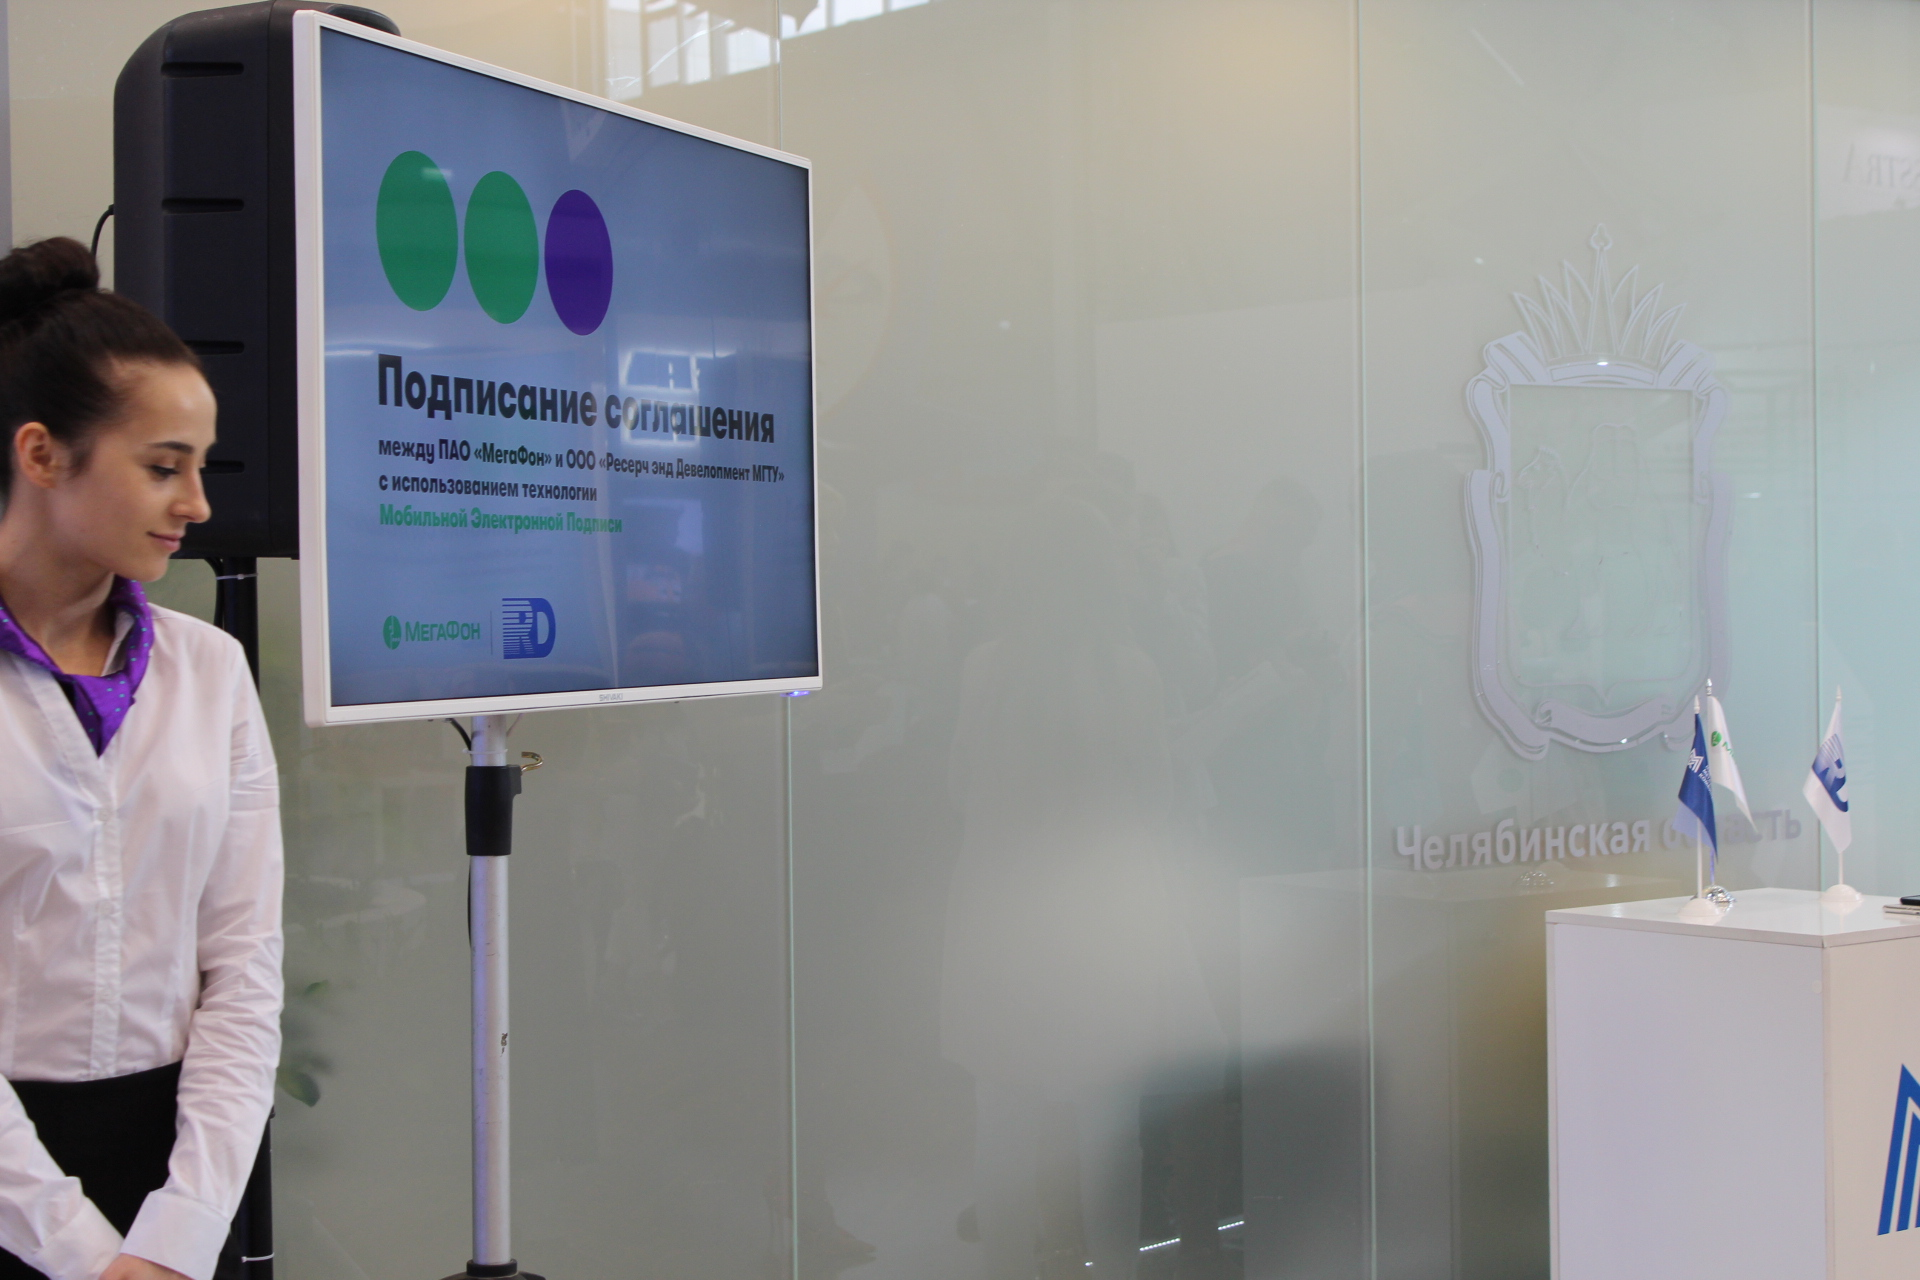 «Мегафон» и МГТУ им. Носова автоматизируют производство на Магнитогорском металлургическом комбинате